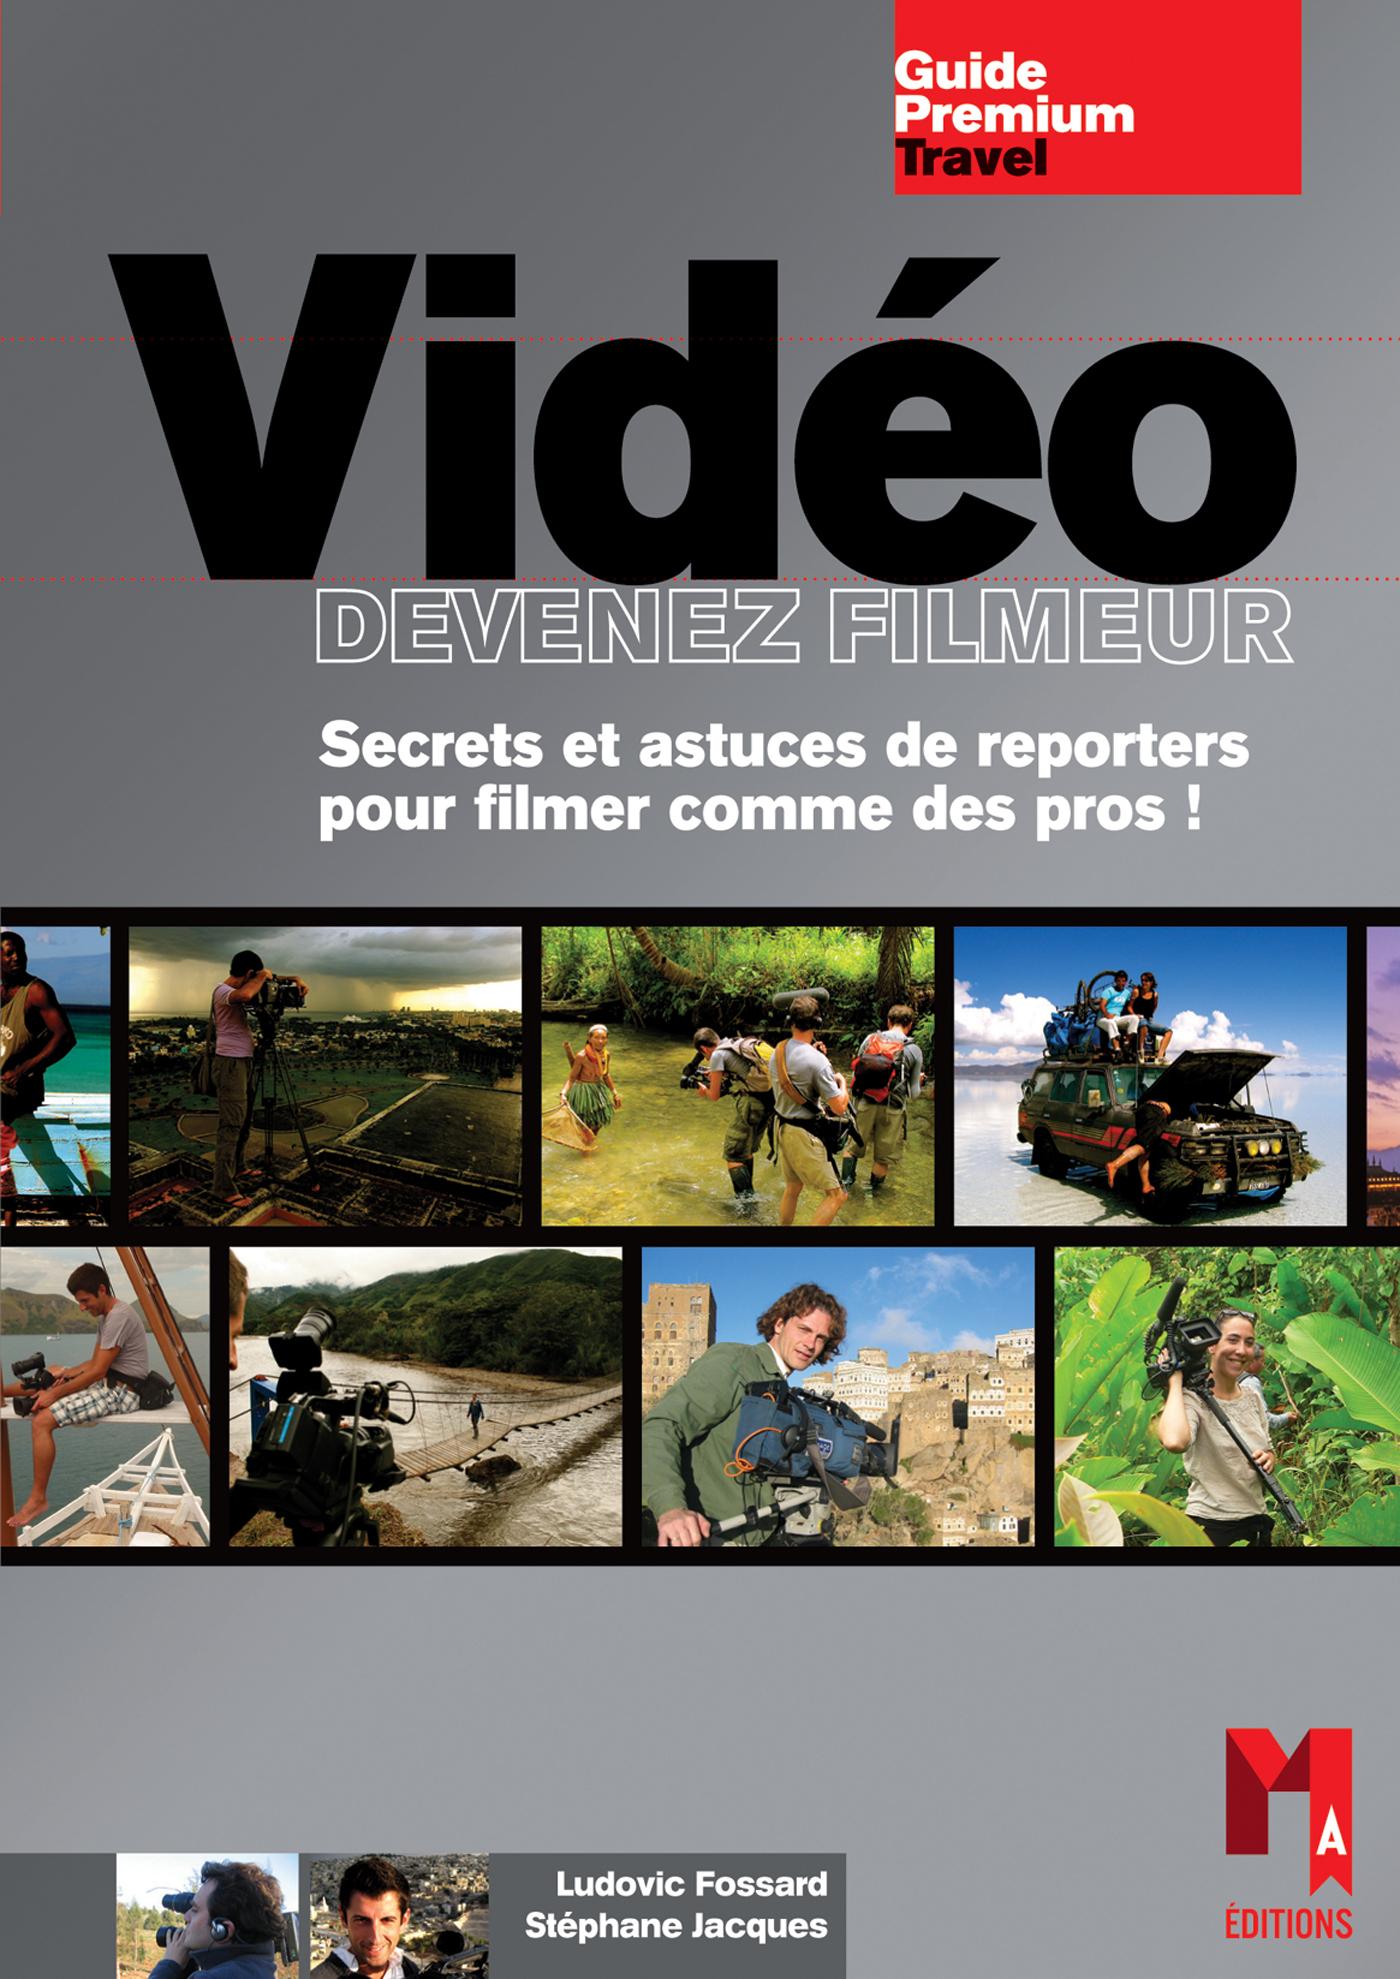 VIDEO - DEVENEZ FILMEUR